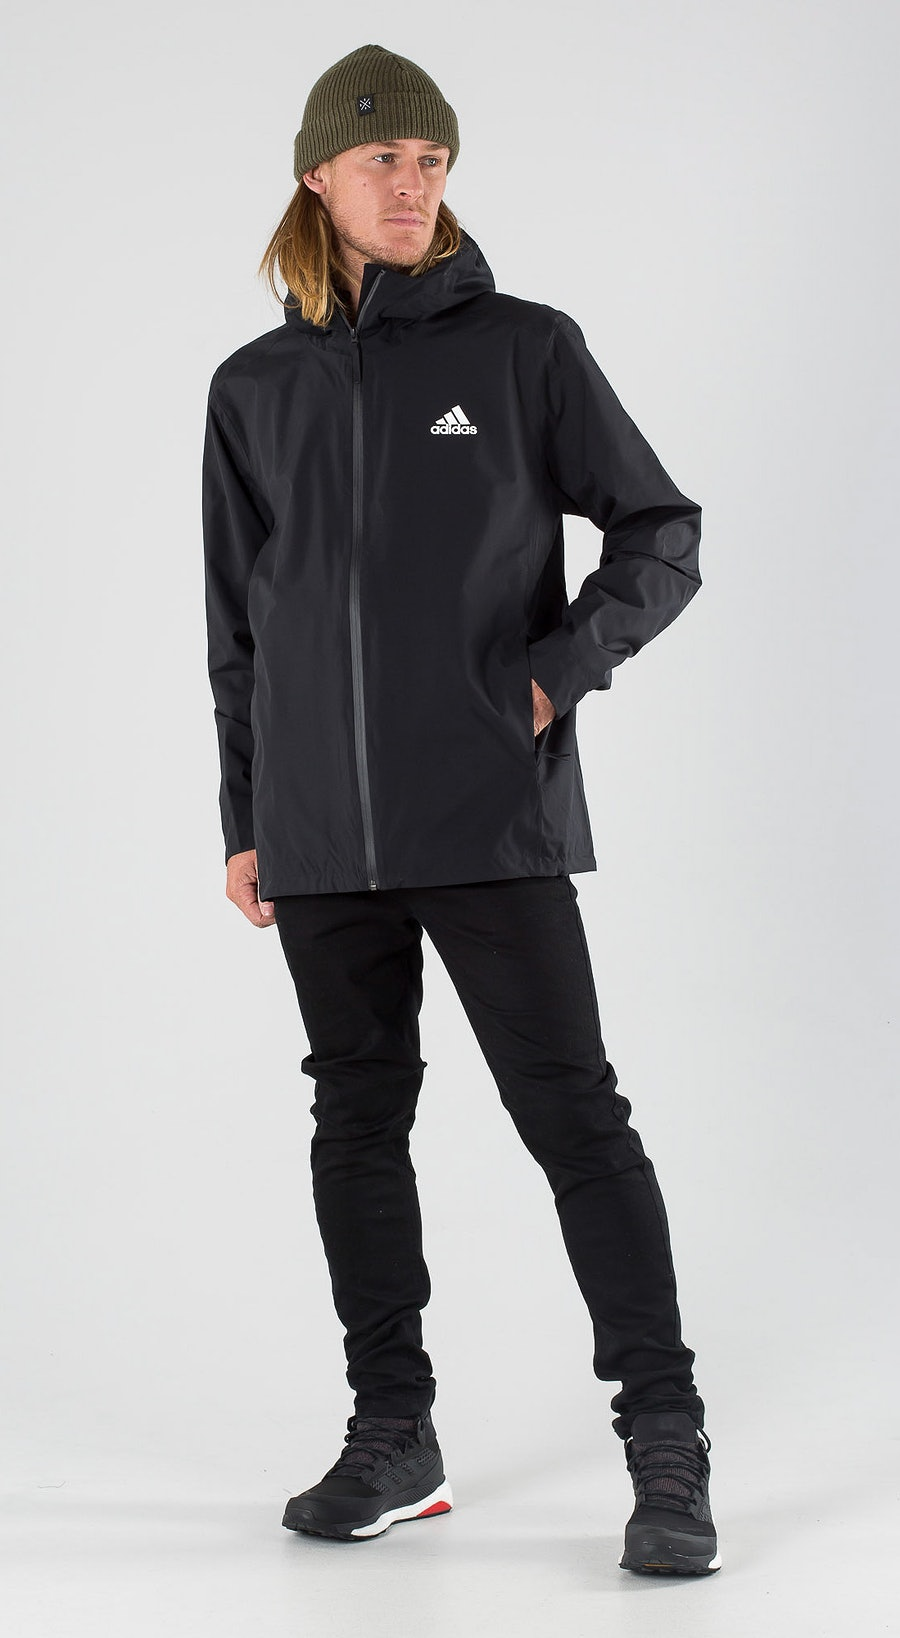 Adidas Terrex BSC 3S Rain RDY Black Outfit Multi